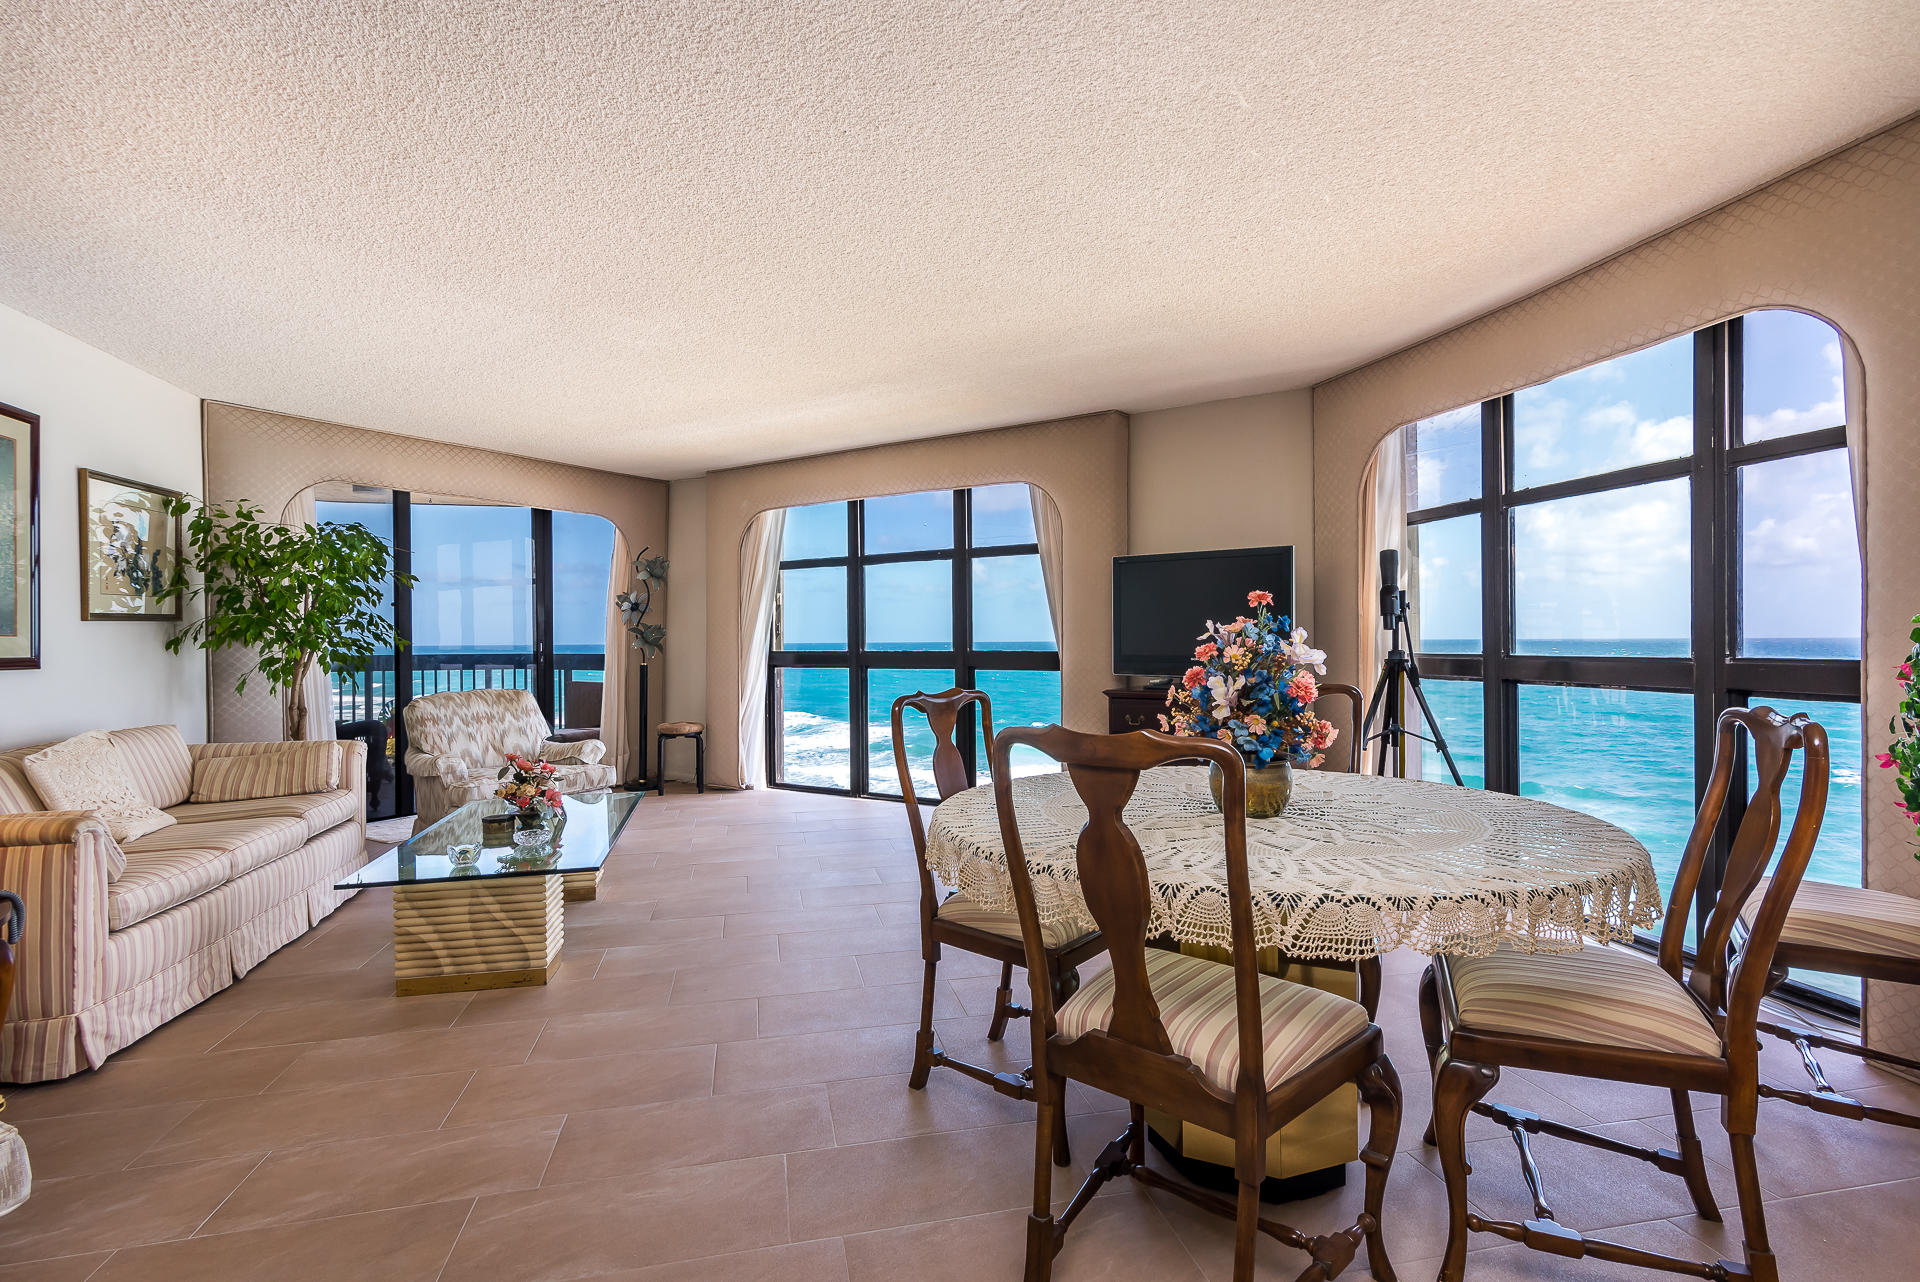 Hillsboro Ocean Club, 1155 Hillsboro Mile Unit 606, Hillsboro Beach, Florida 33062